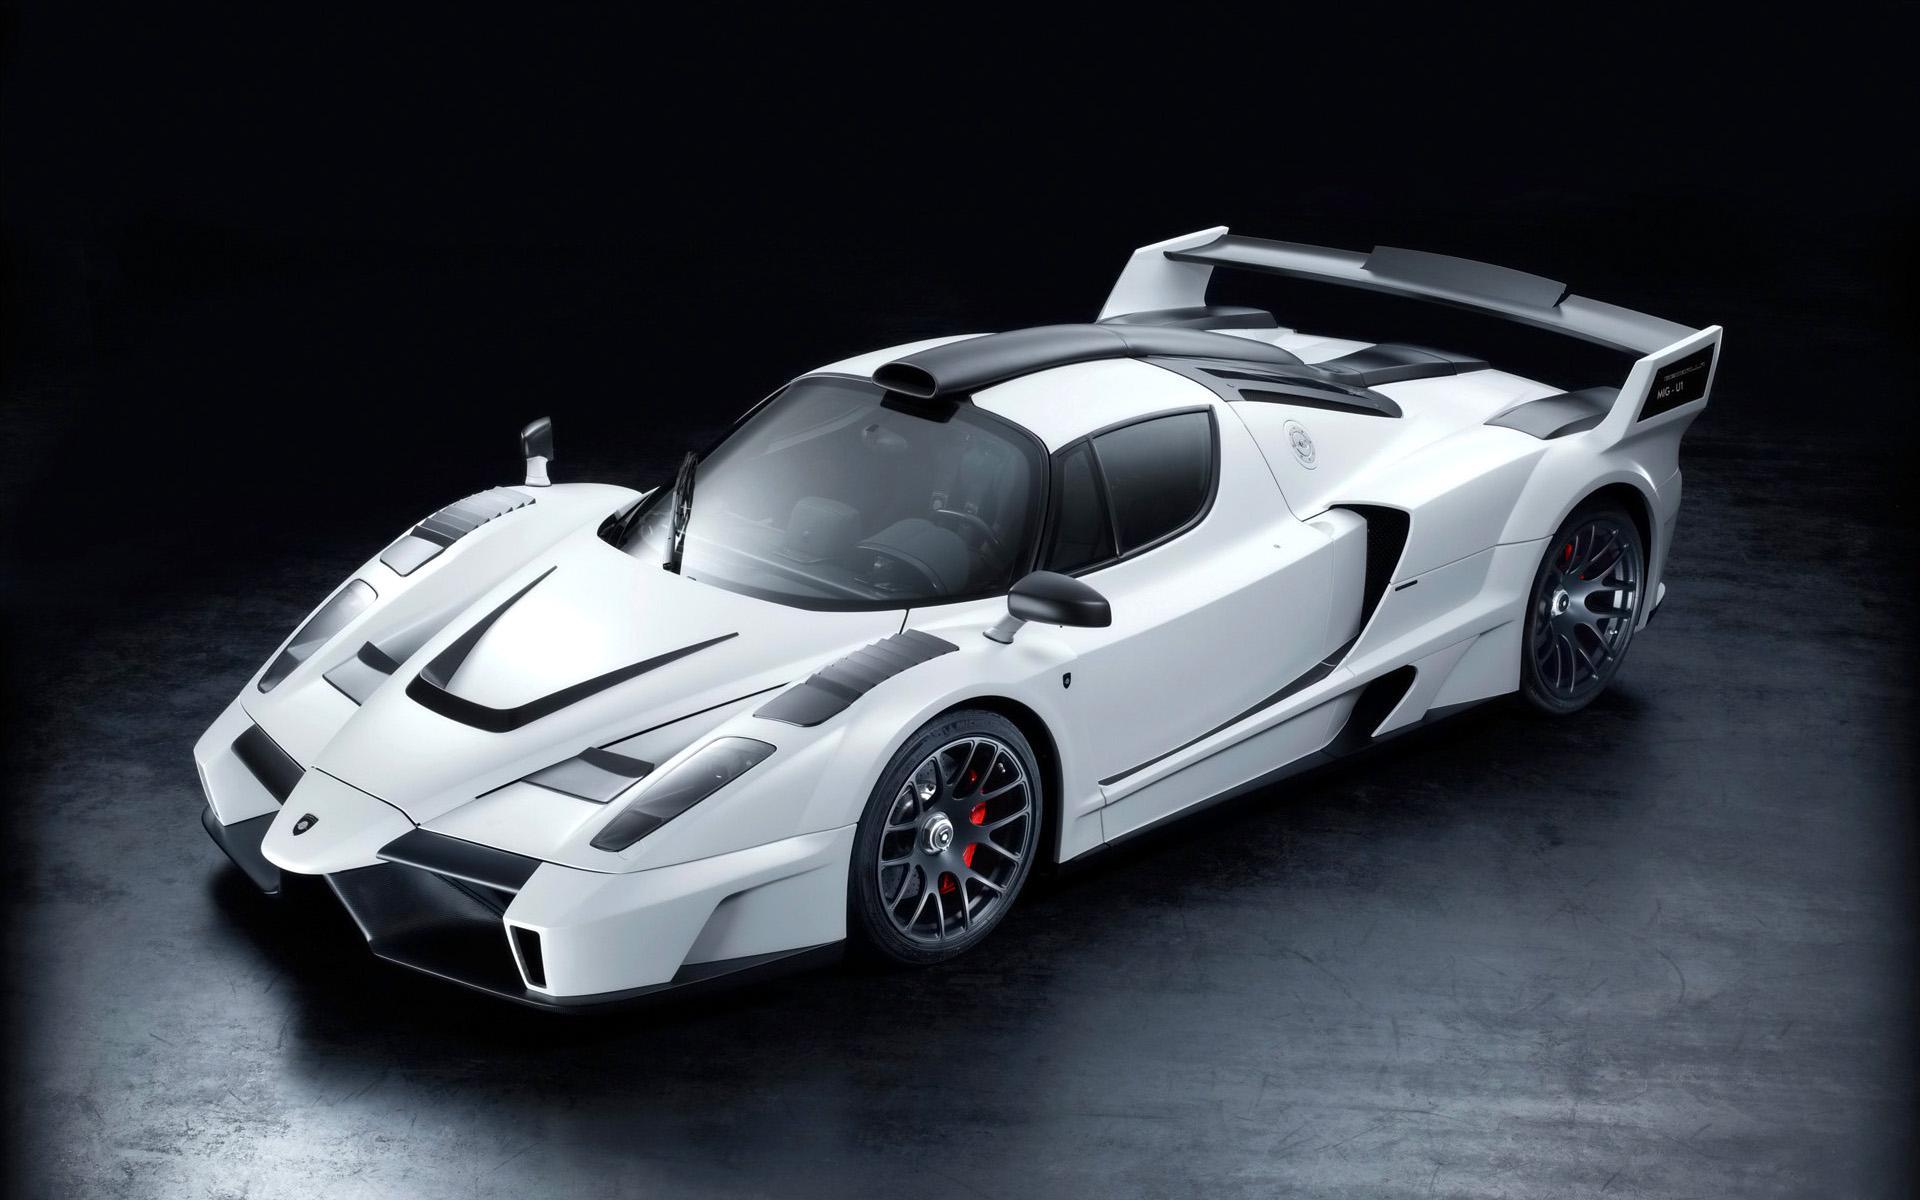 Cool White Ferrari Wallpaper